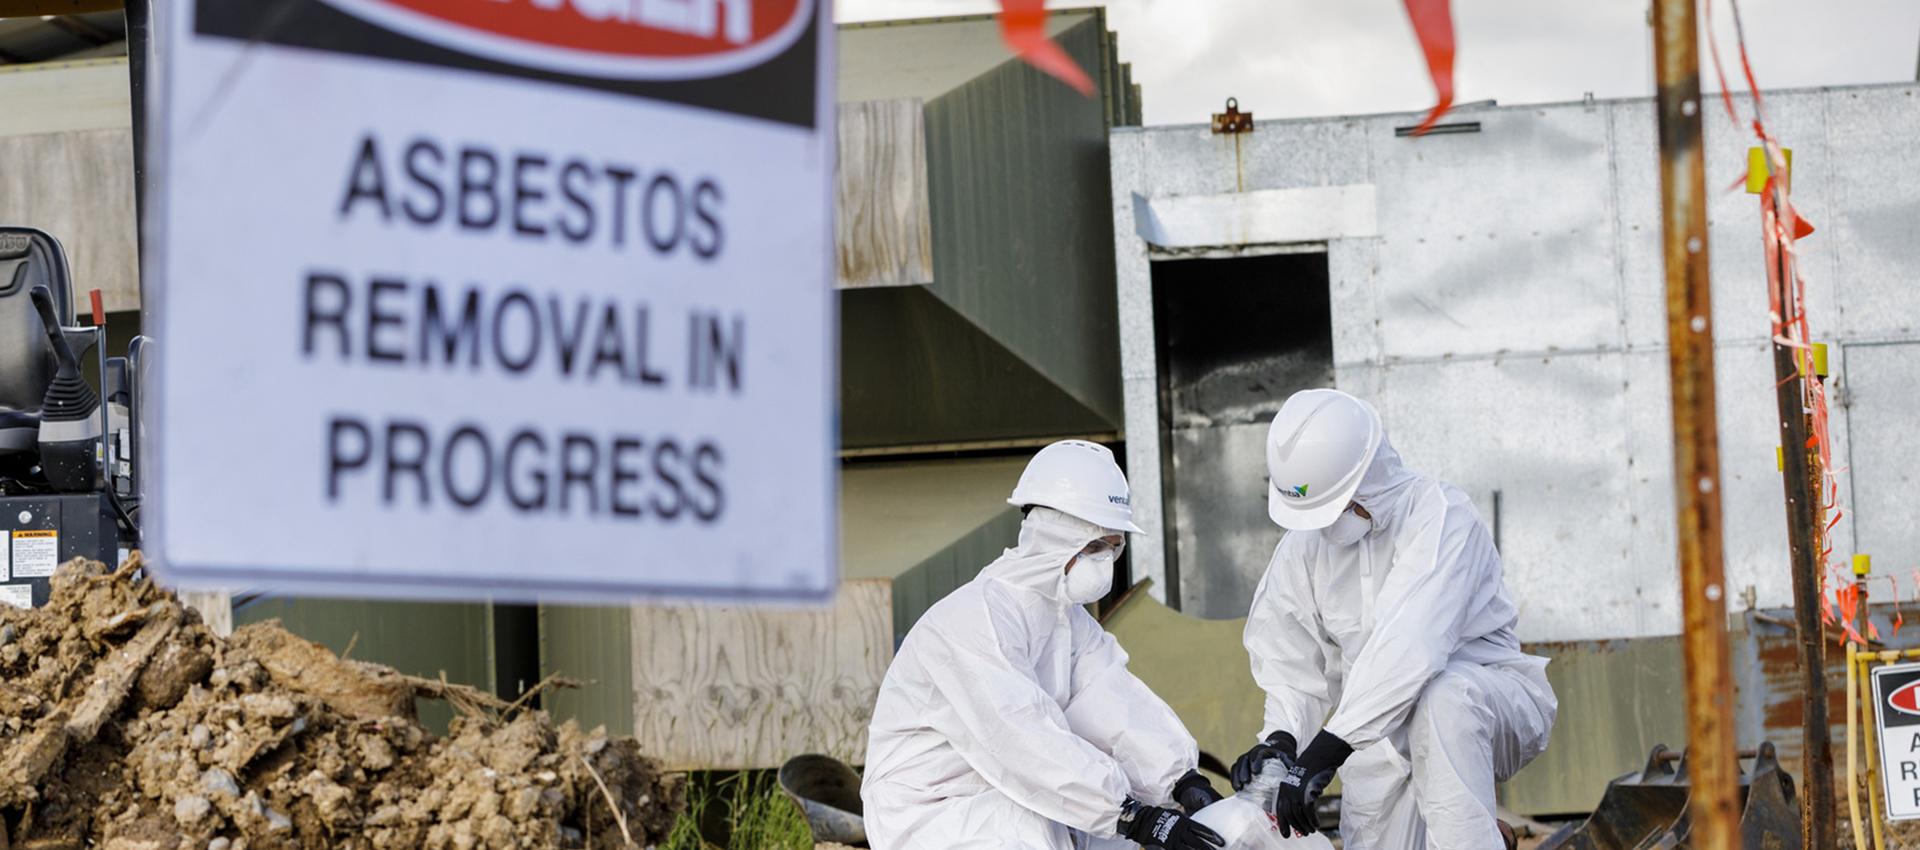 Asbestos removal Perth.